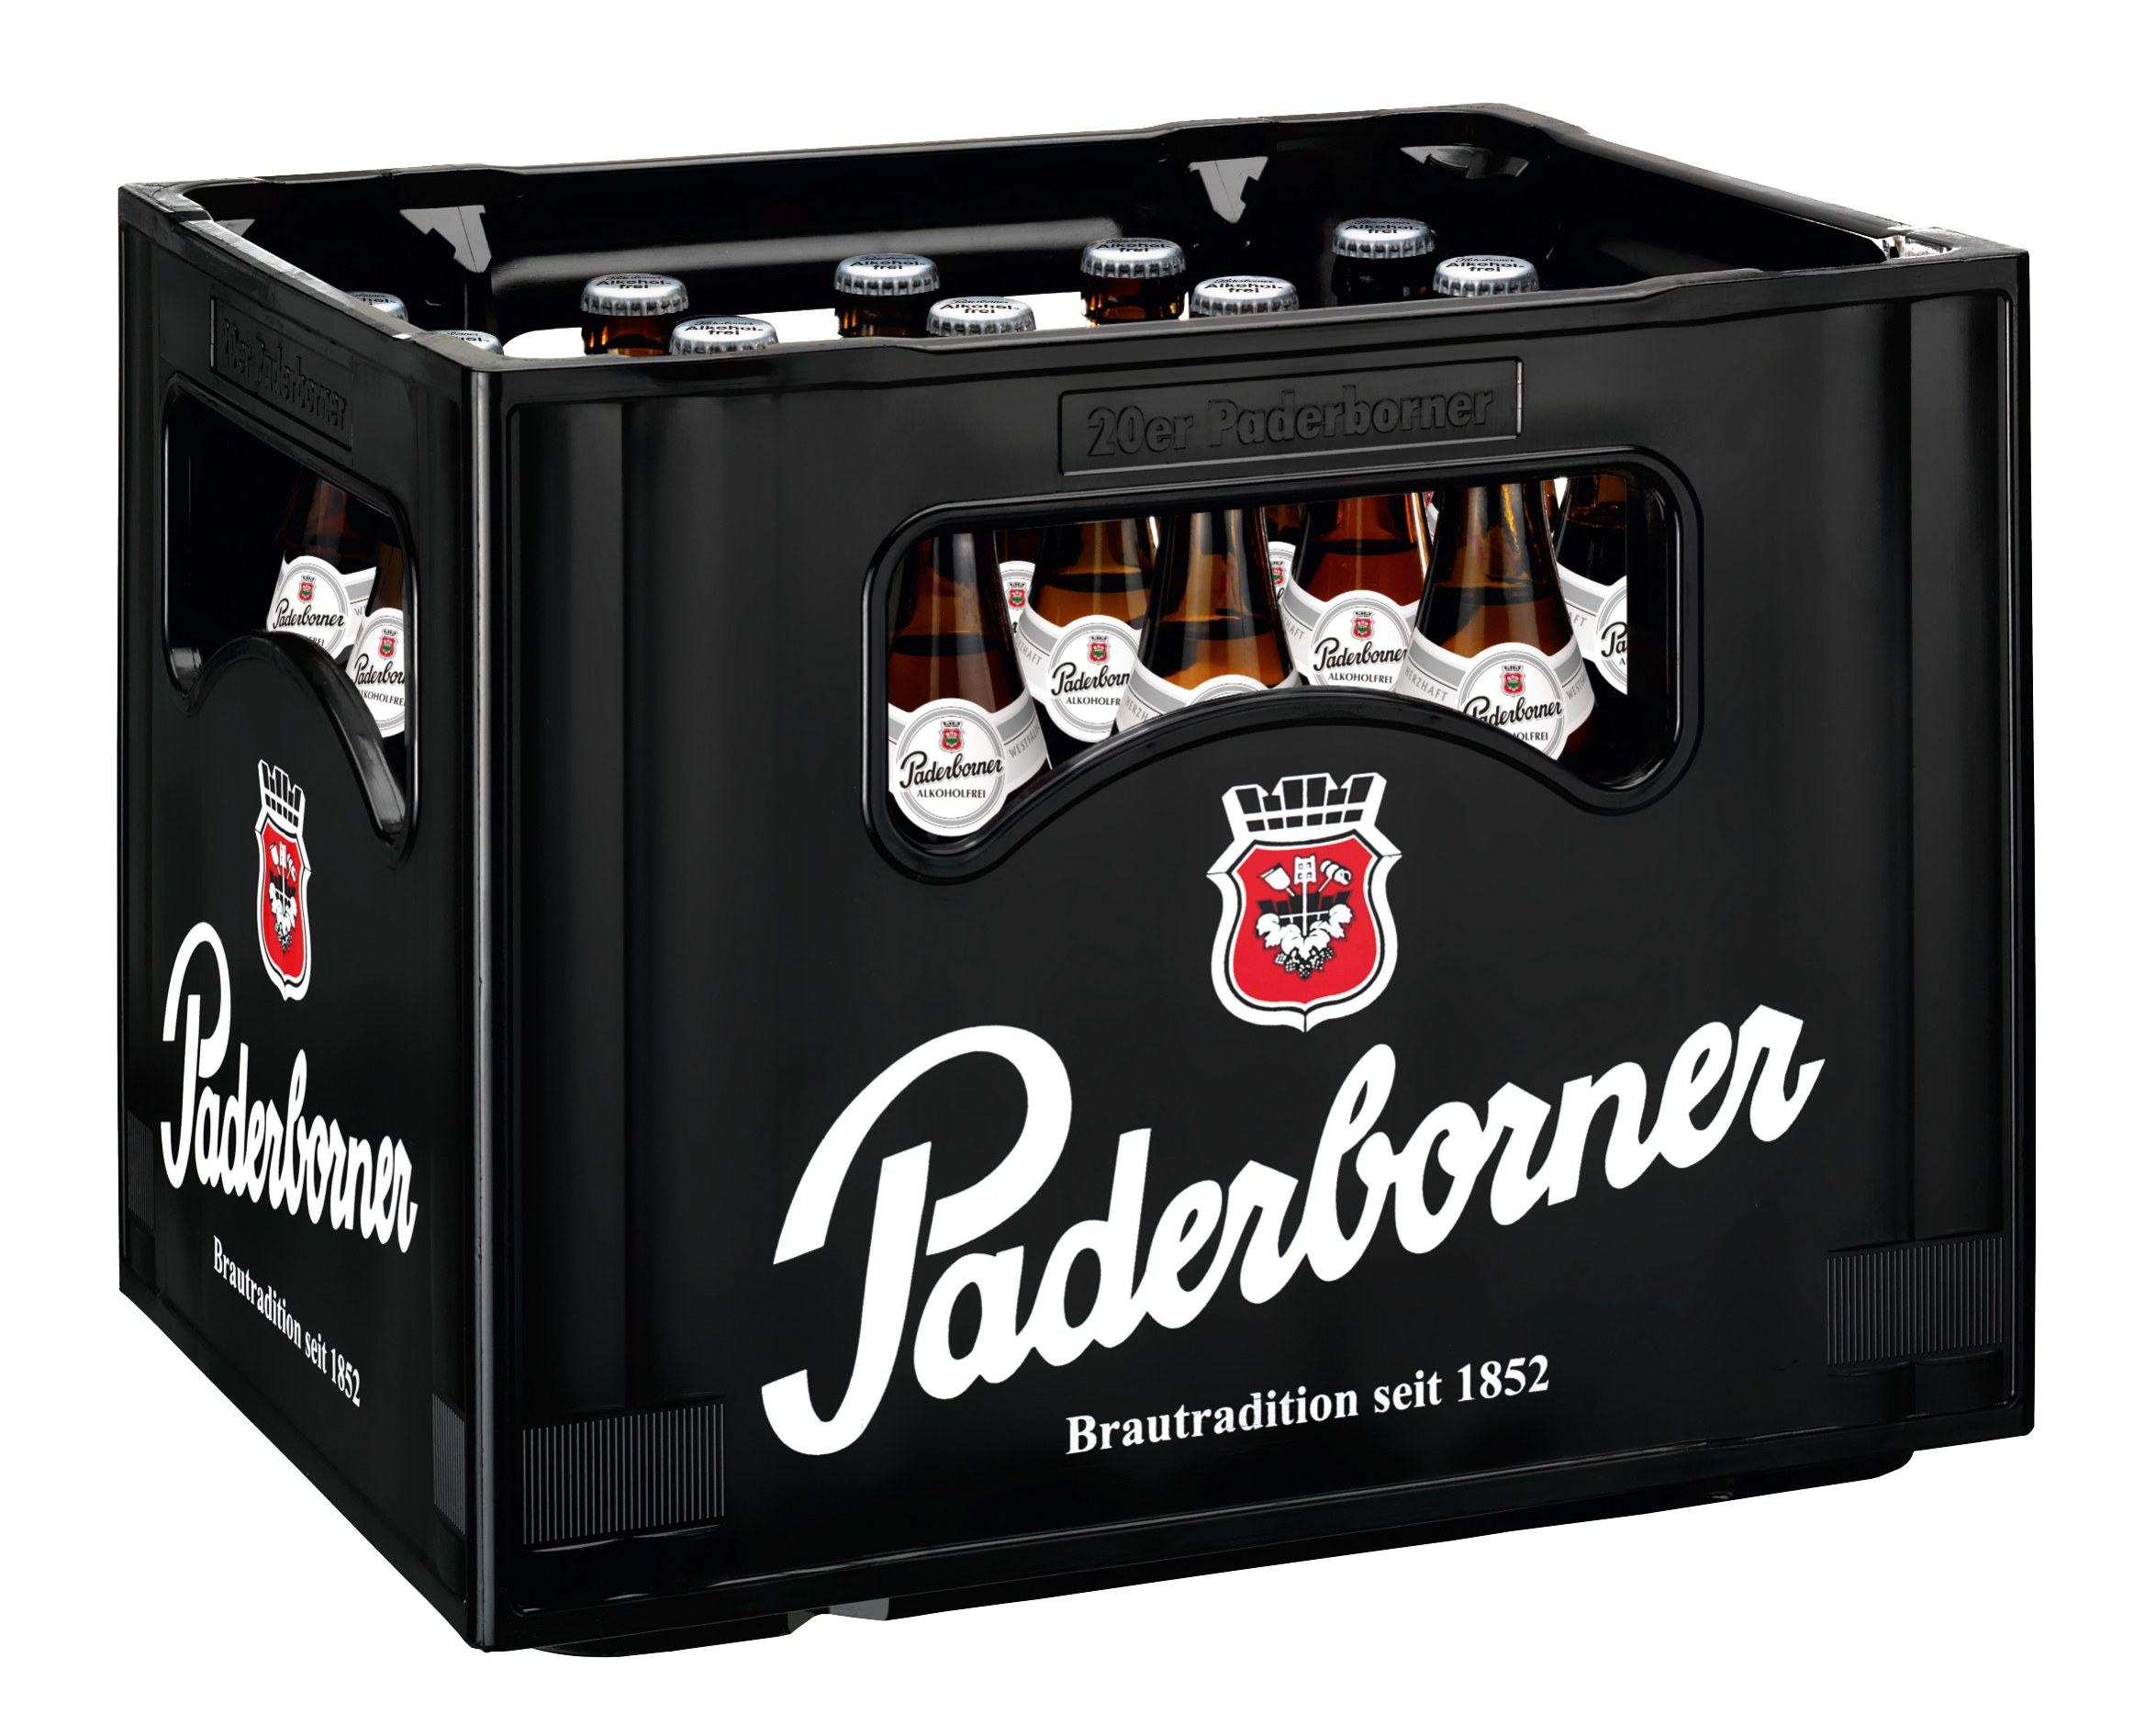 Paderborner Alkoholfrei 20x0,5l Mehrweg Glas